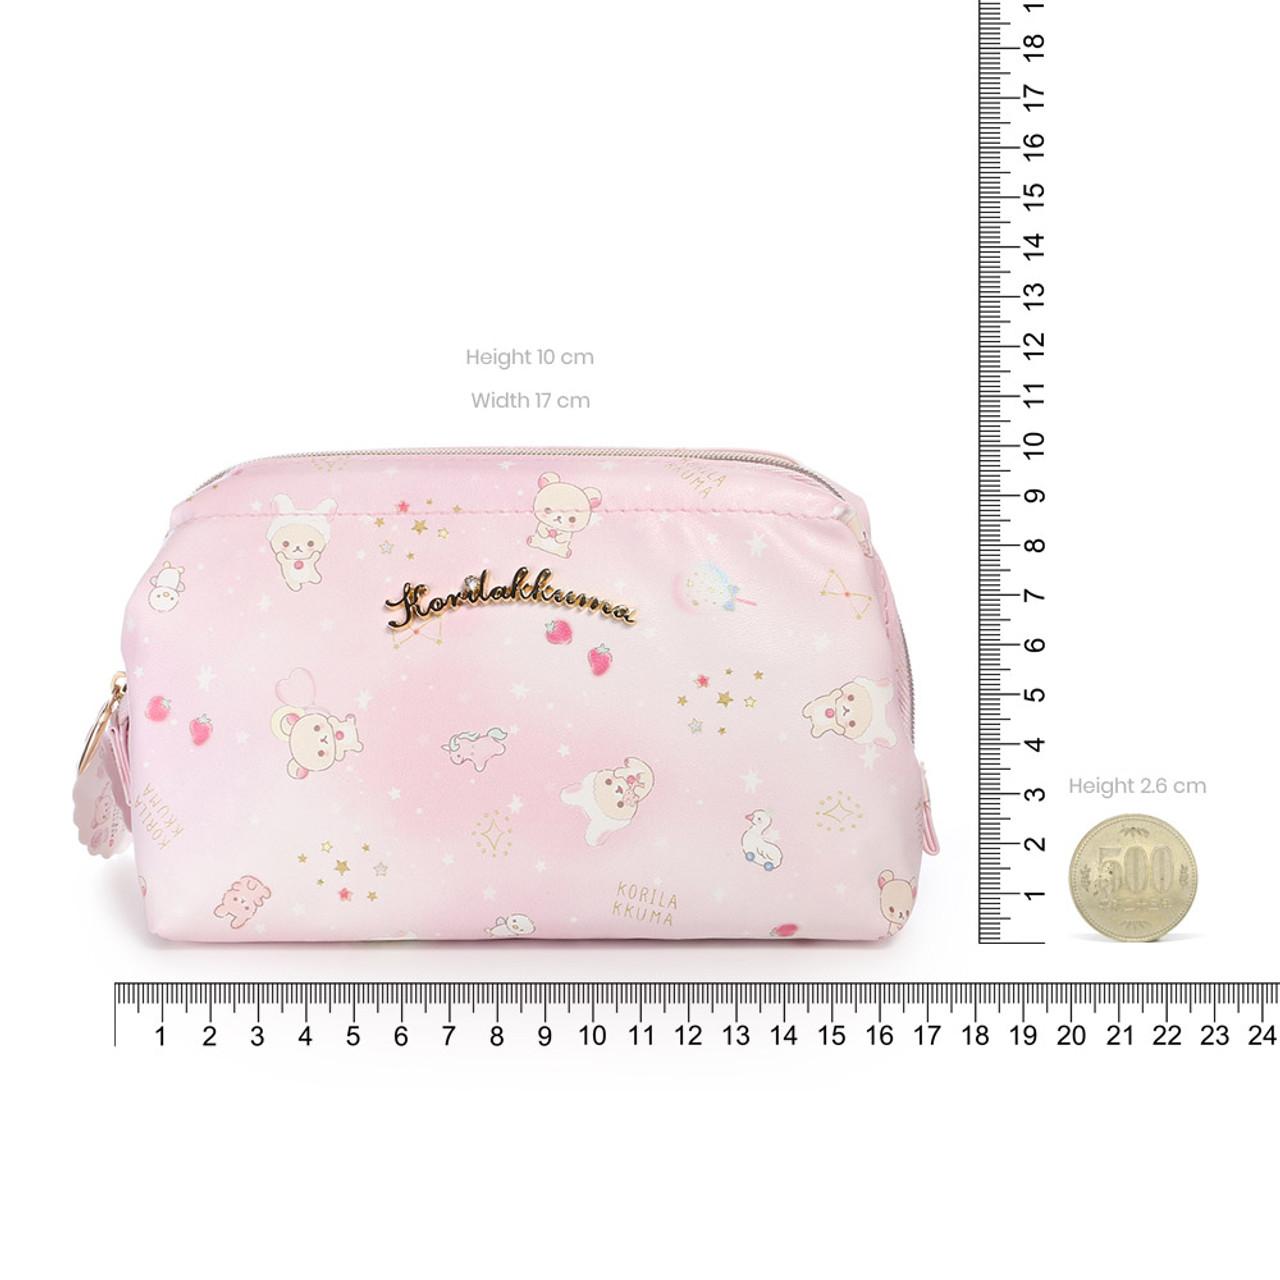 Korilakkuma Pink Fantasty Dream Pouch ( Proportion )